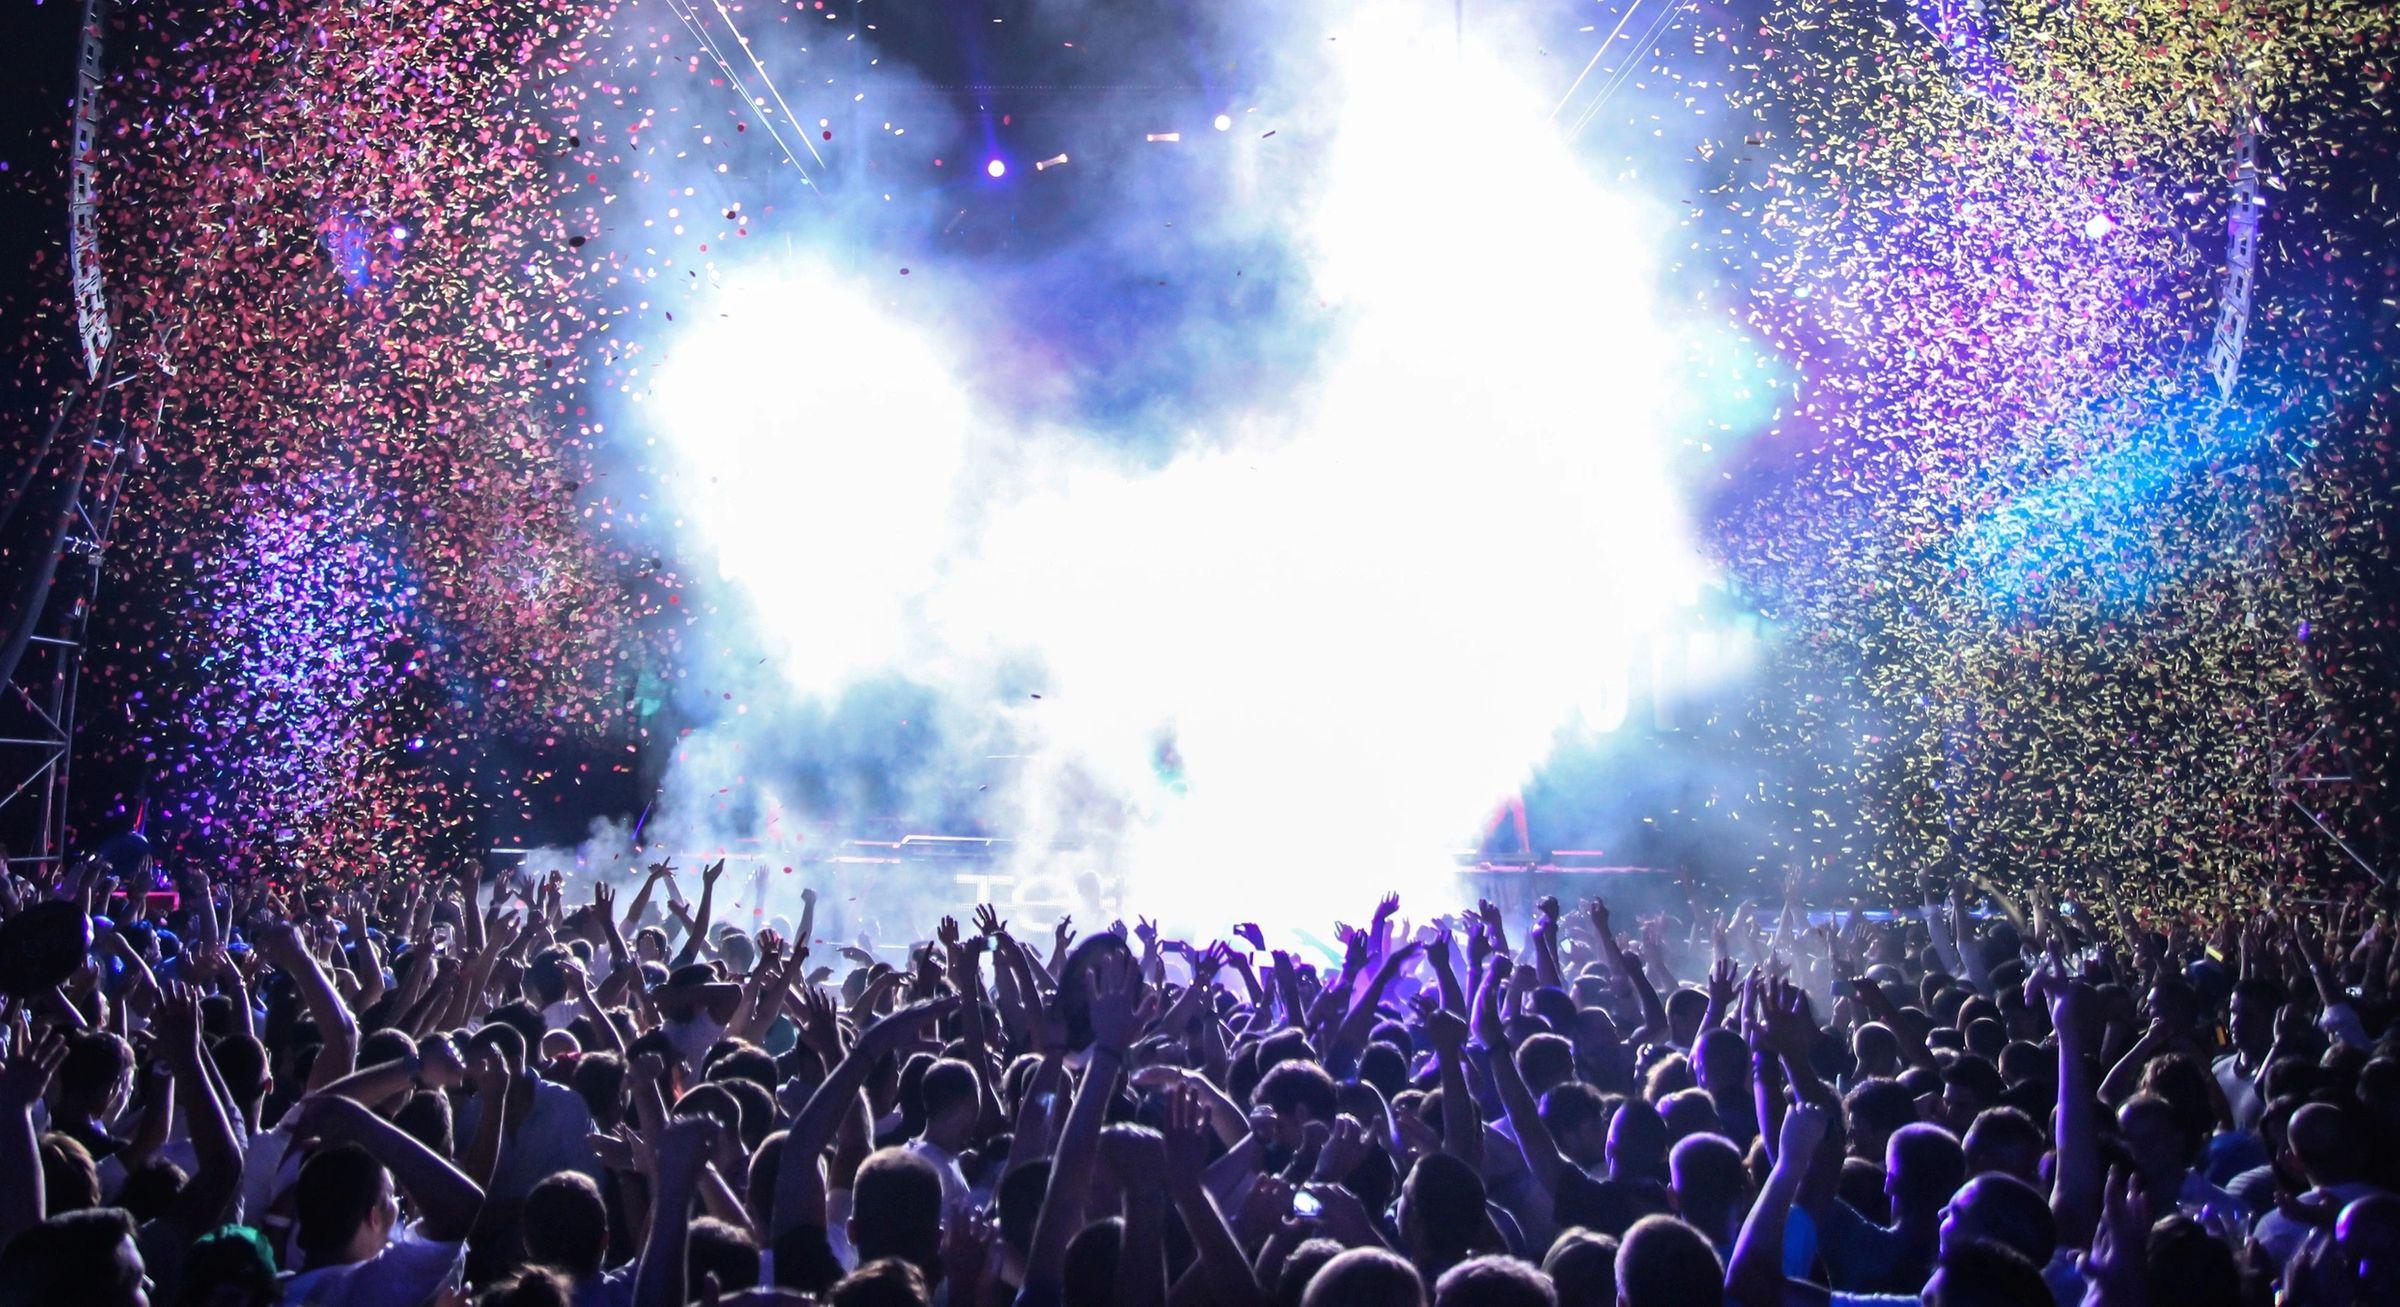 Newport Beach DJ Hustle Events Entertainment DJ Service DJ Hustle